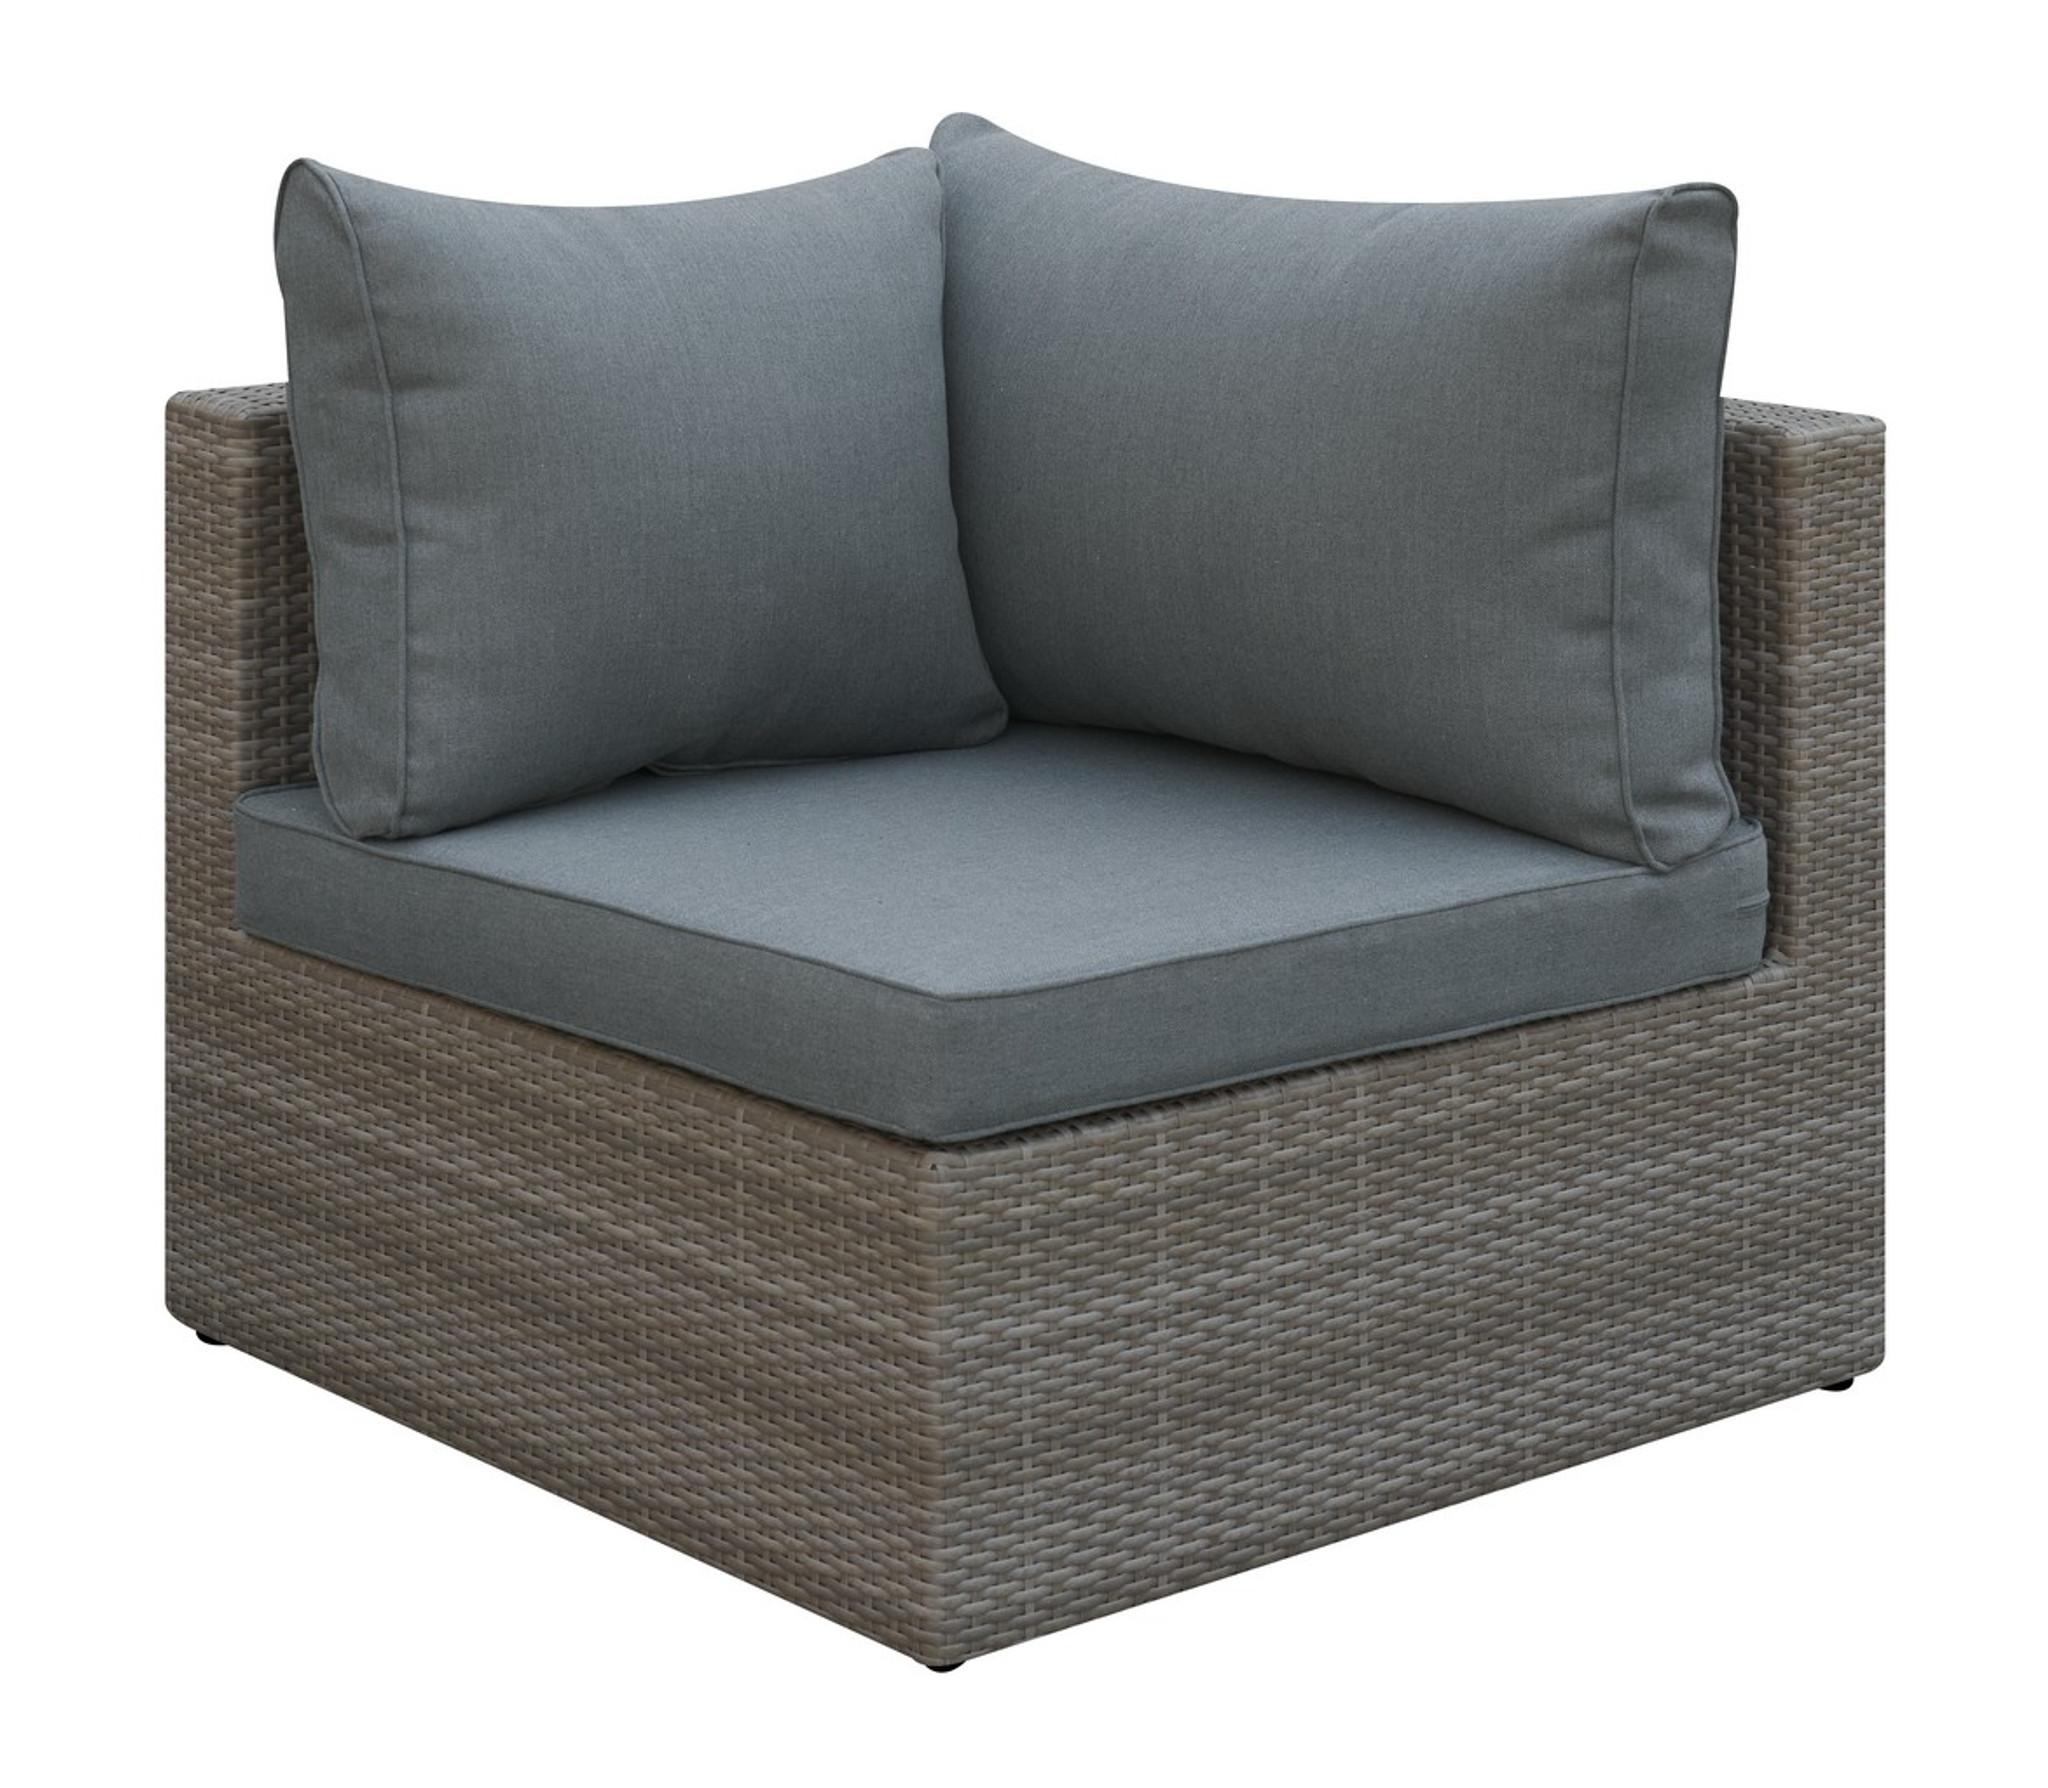 Kassa Mall Home Furniture P50141 Outdoor Corner Wedge Tan Resin